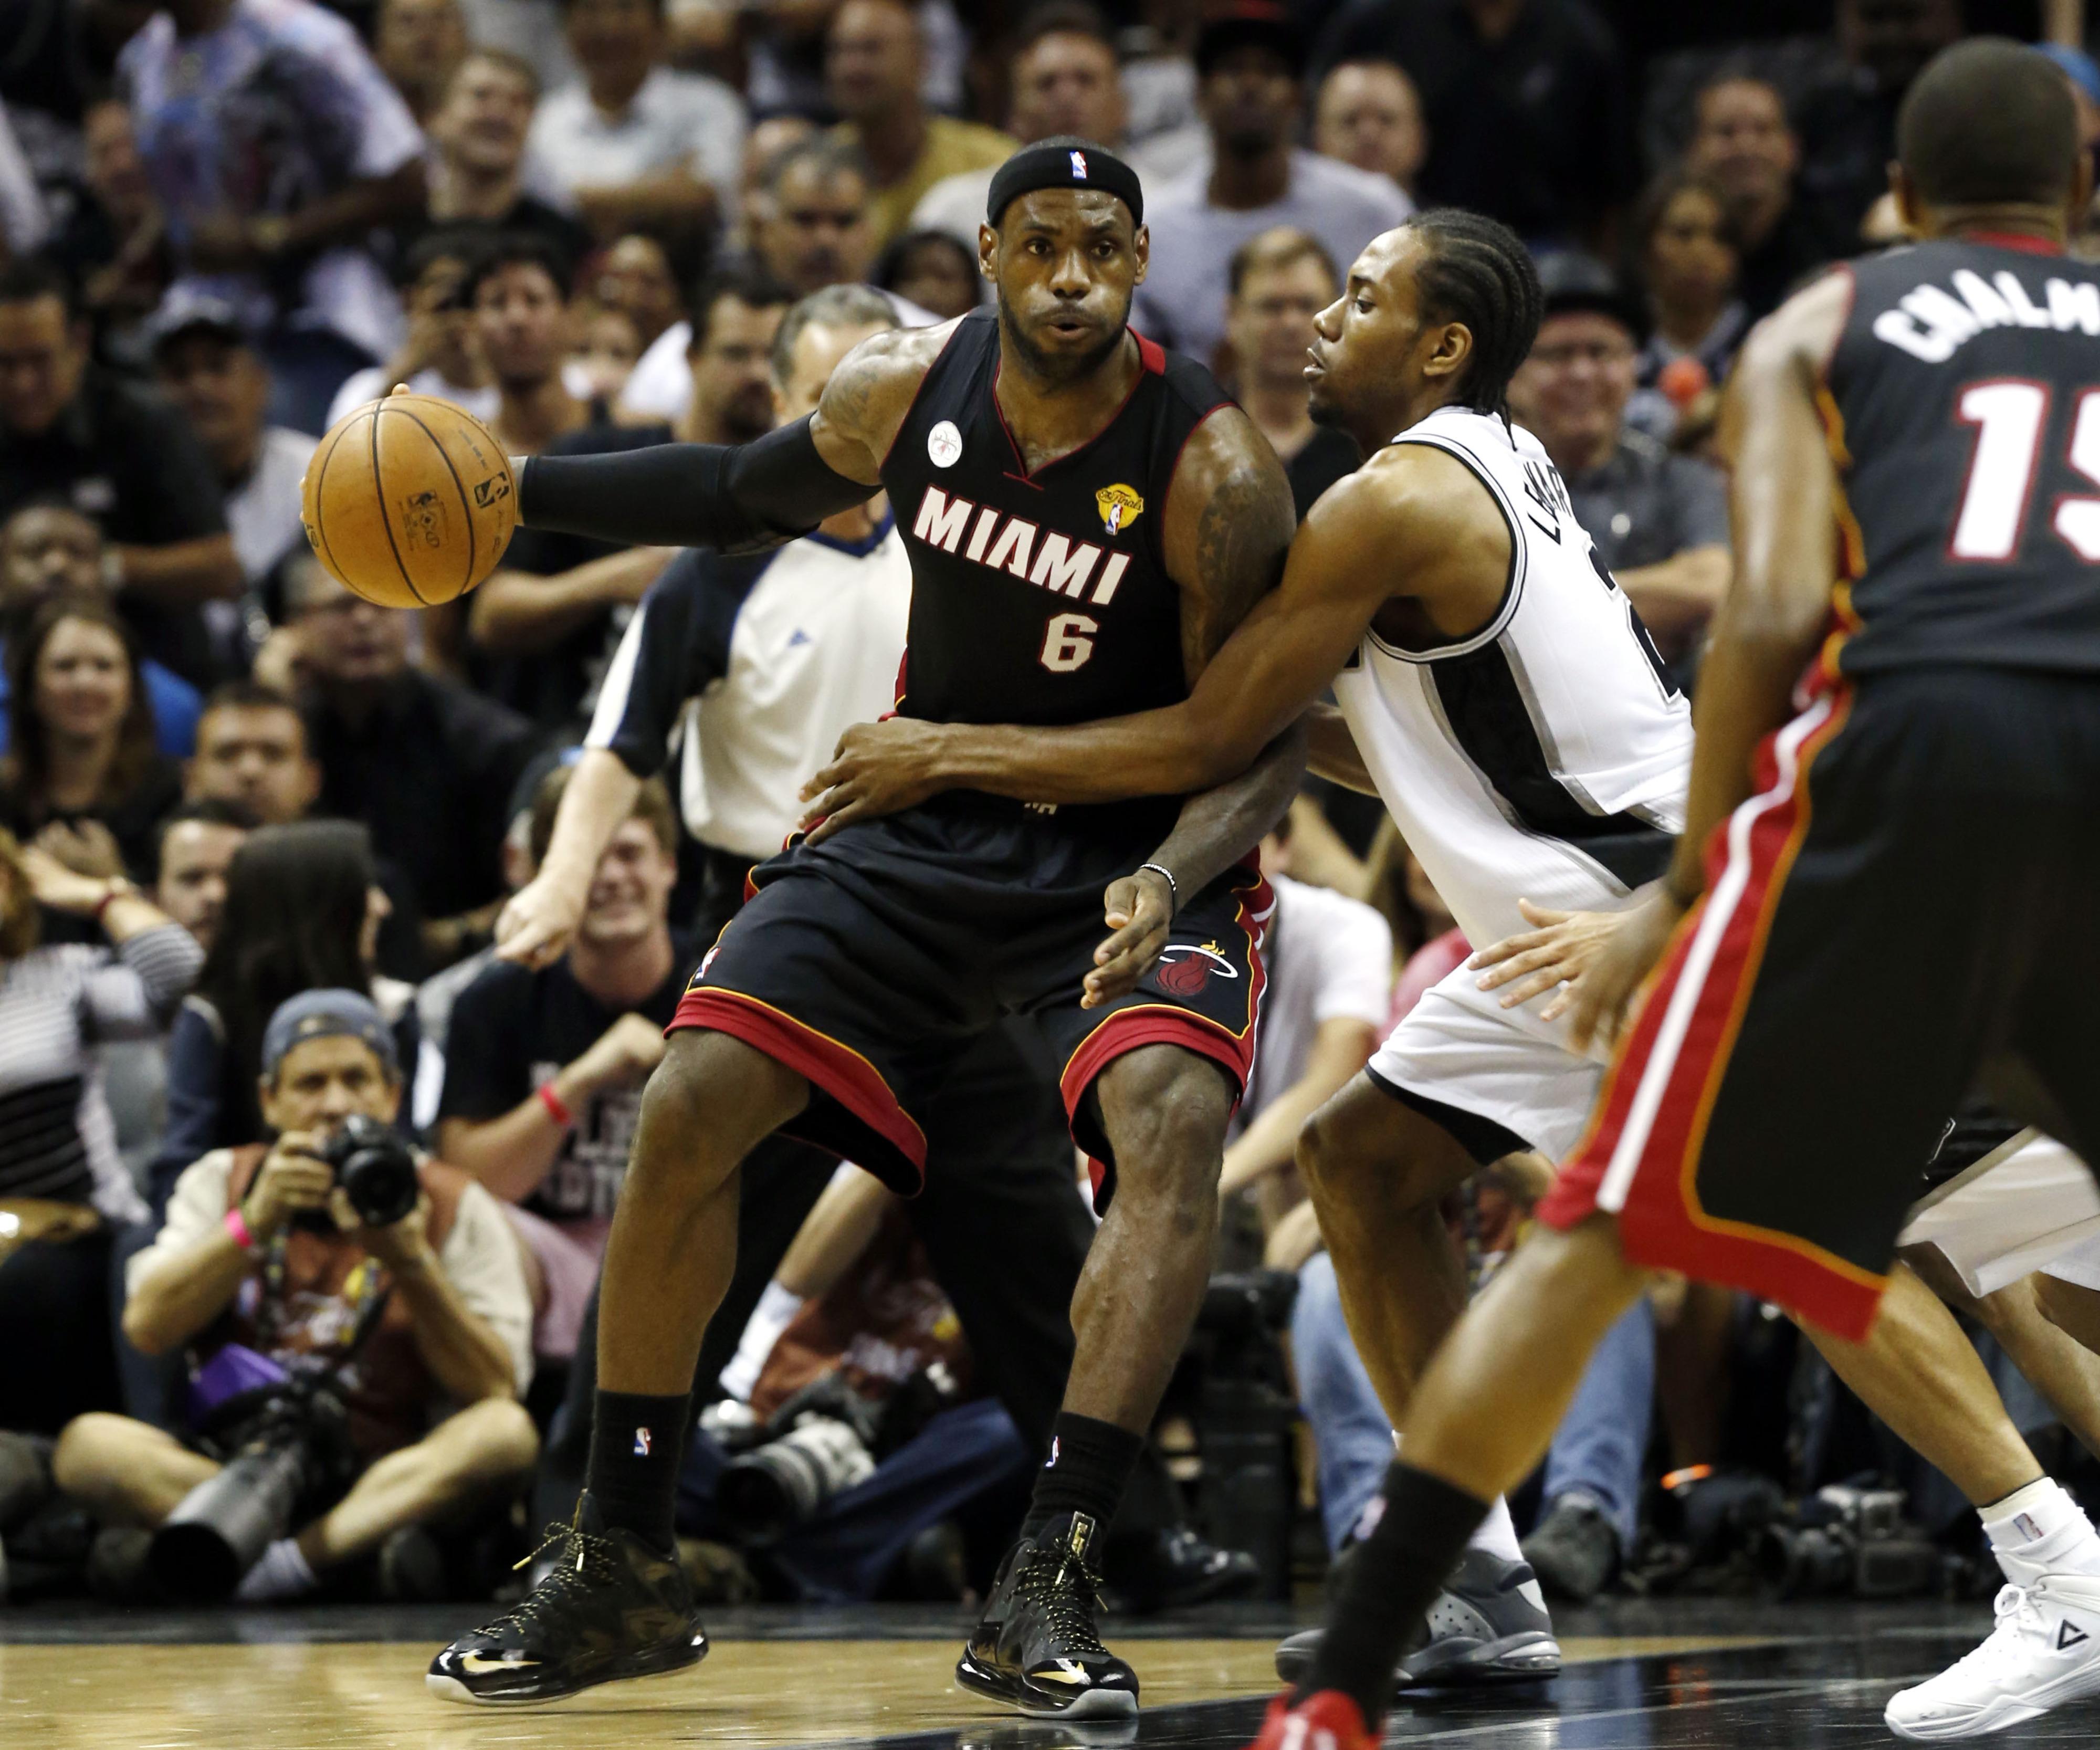 Heat vs. Spurs score update, NBA Finals Game 4: Spurs and Heat tied 49-49 through first half